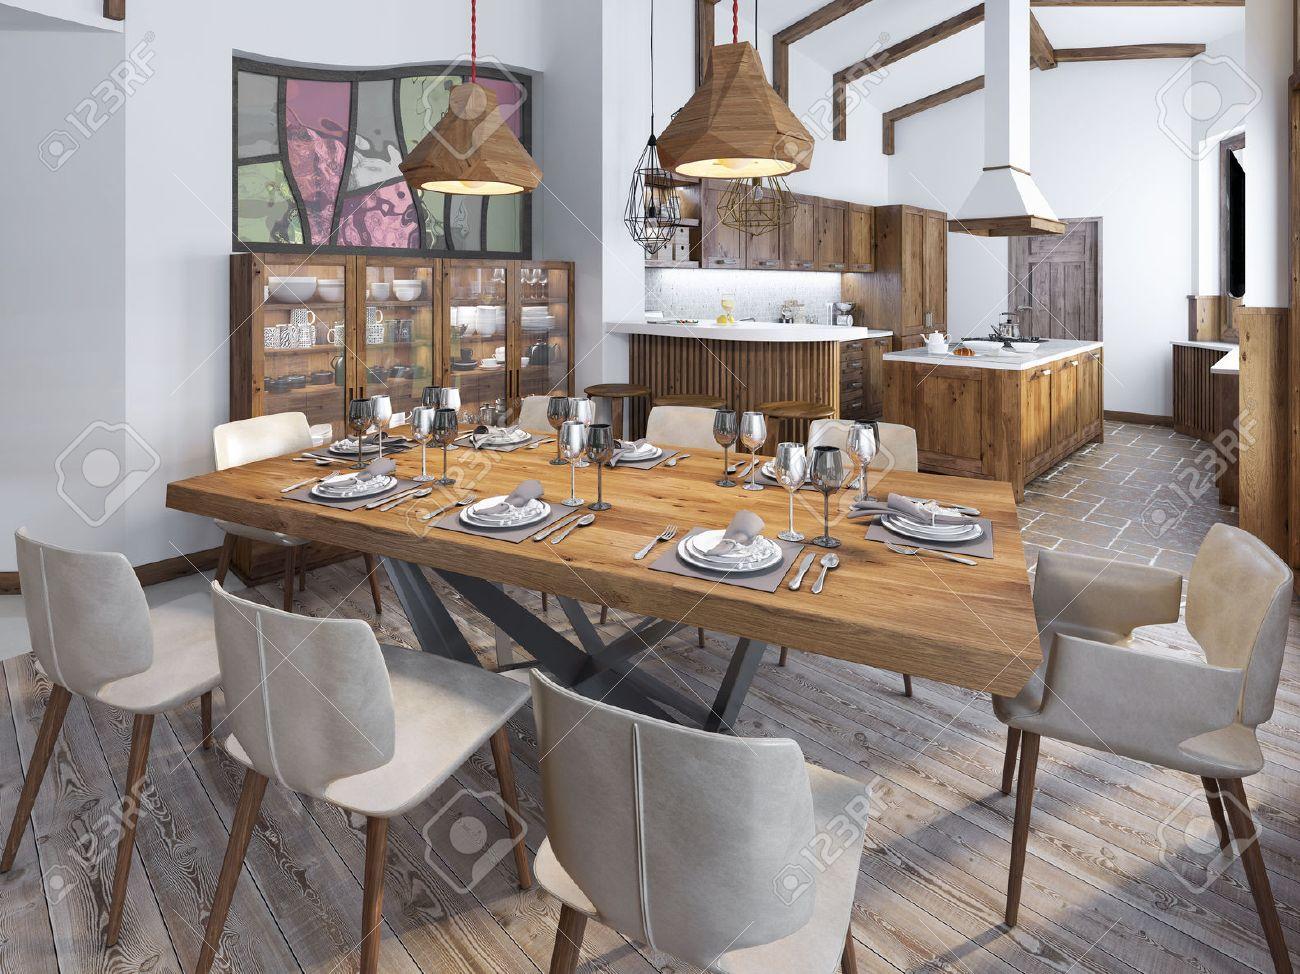 Cucina Moderna E Sala Da Pranzo Nel Soppalco. Mobili Da Cucina In ...